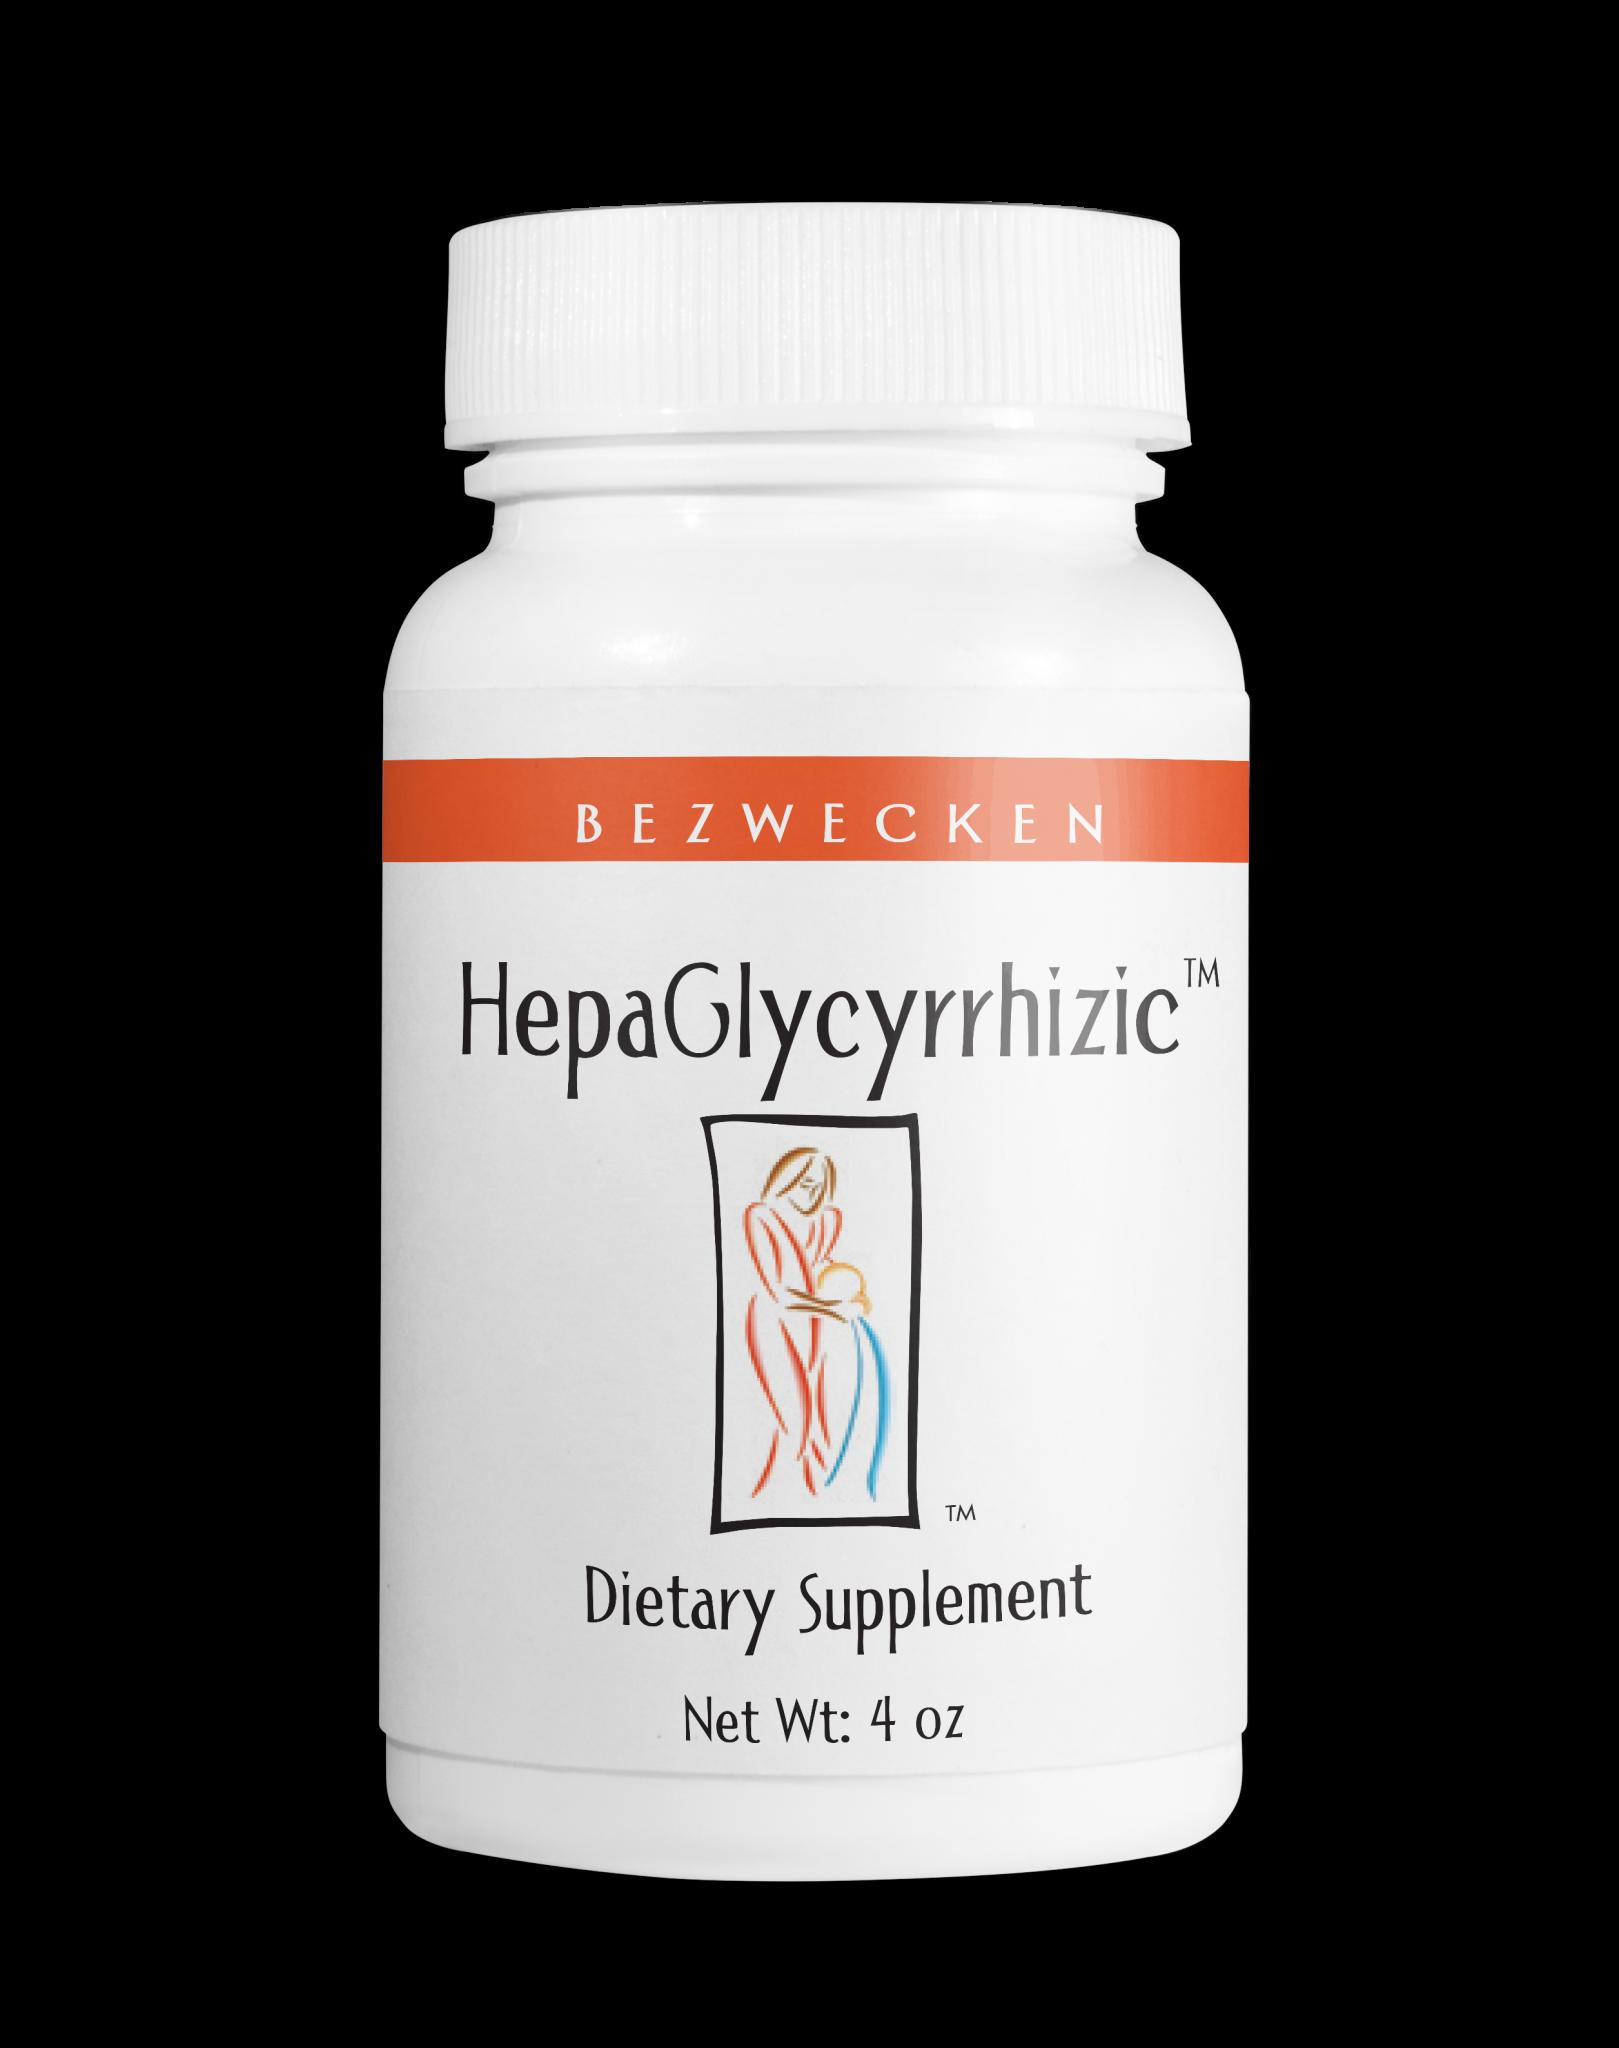 HepaGlycyrrhizic 4 oz